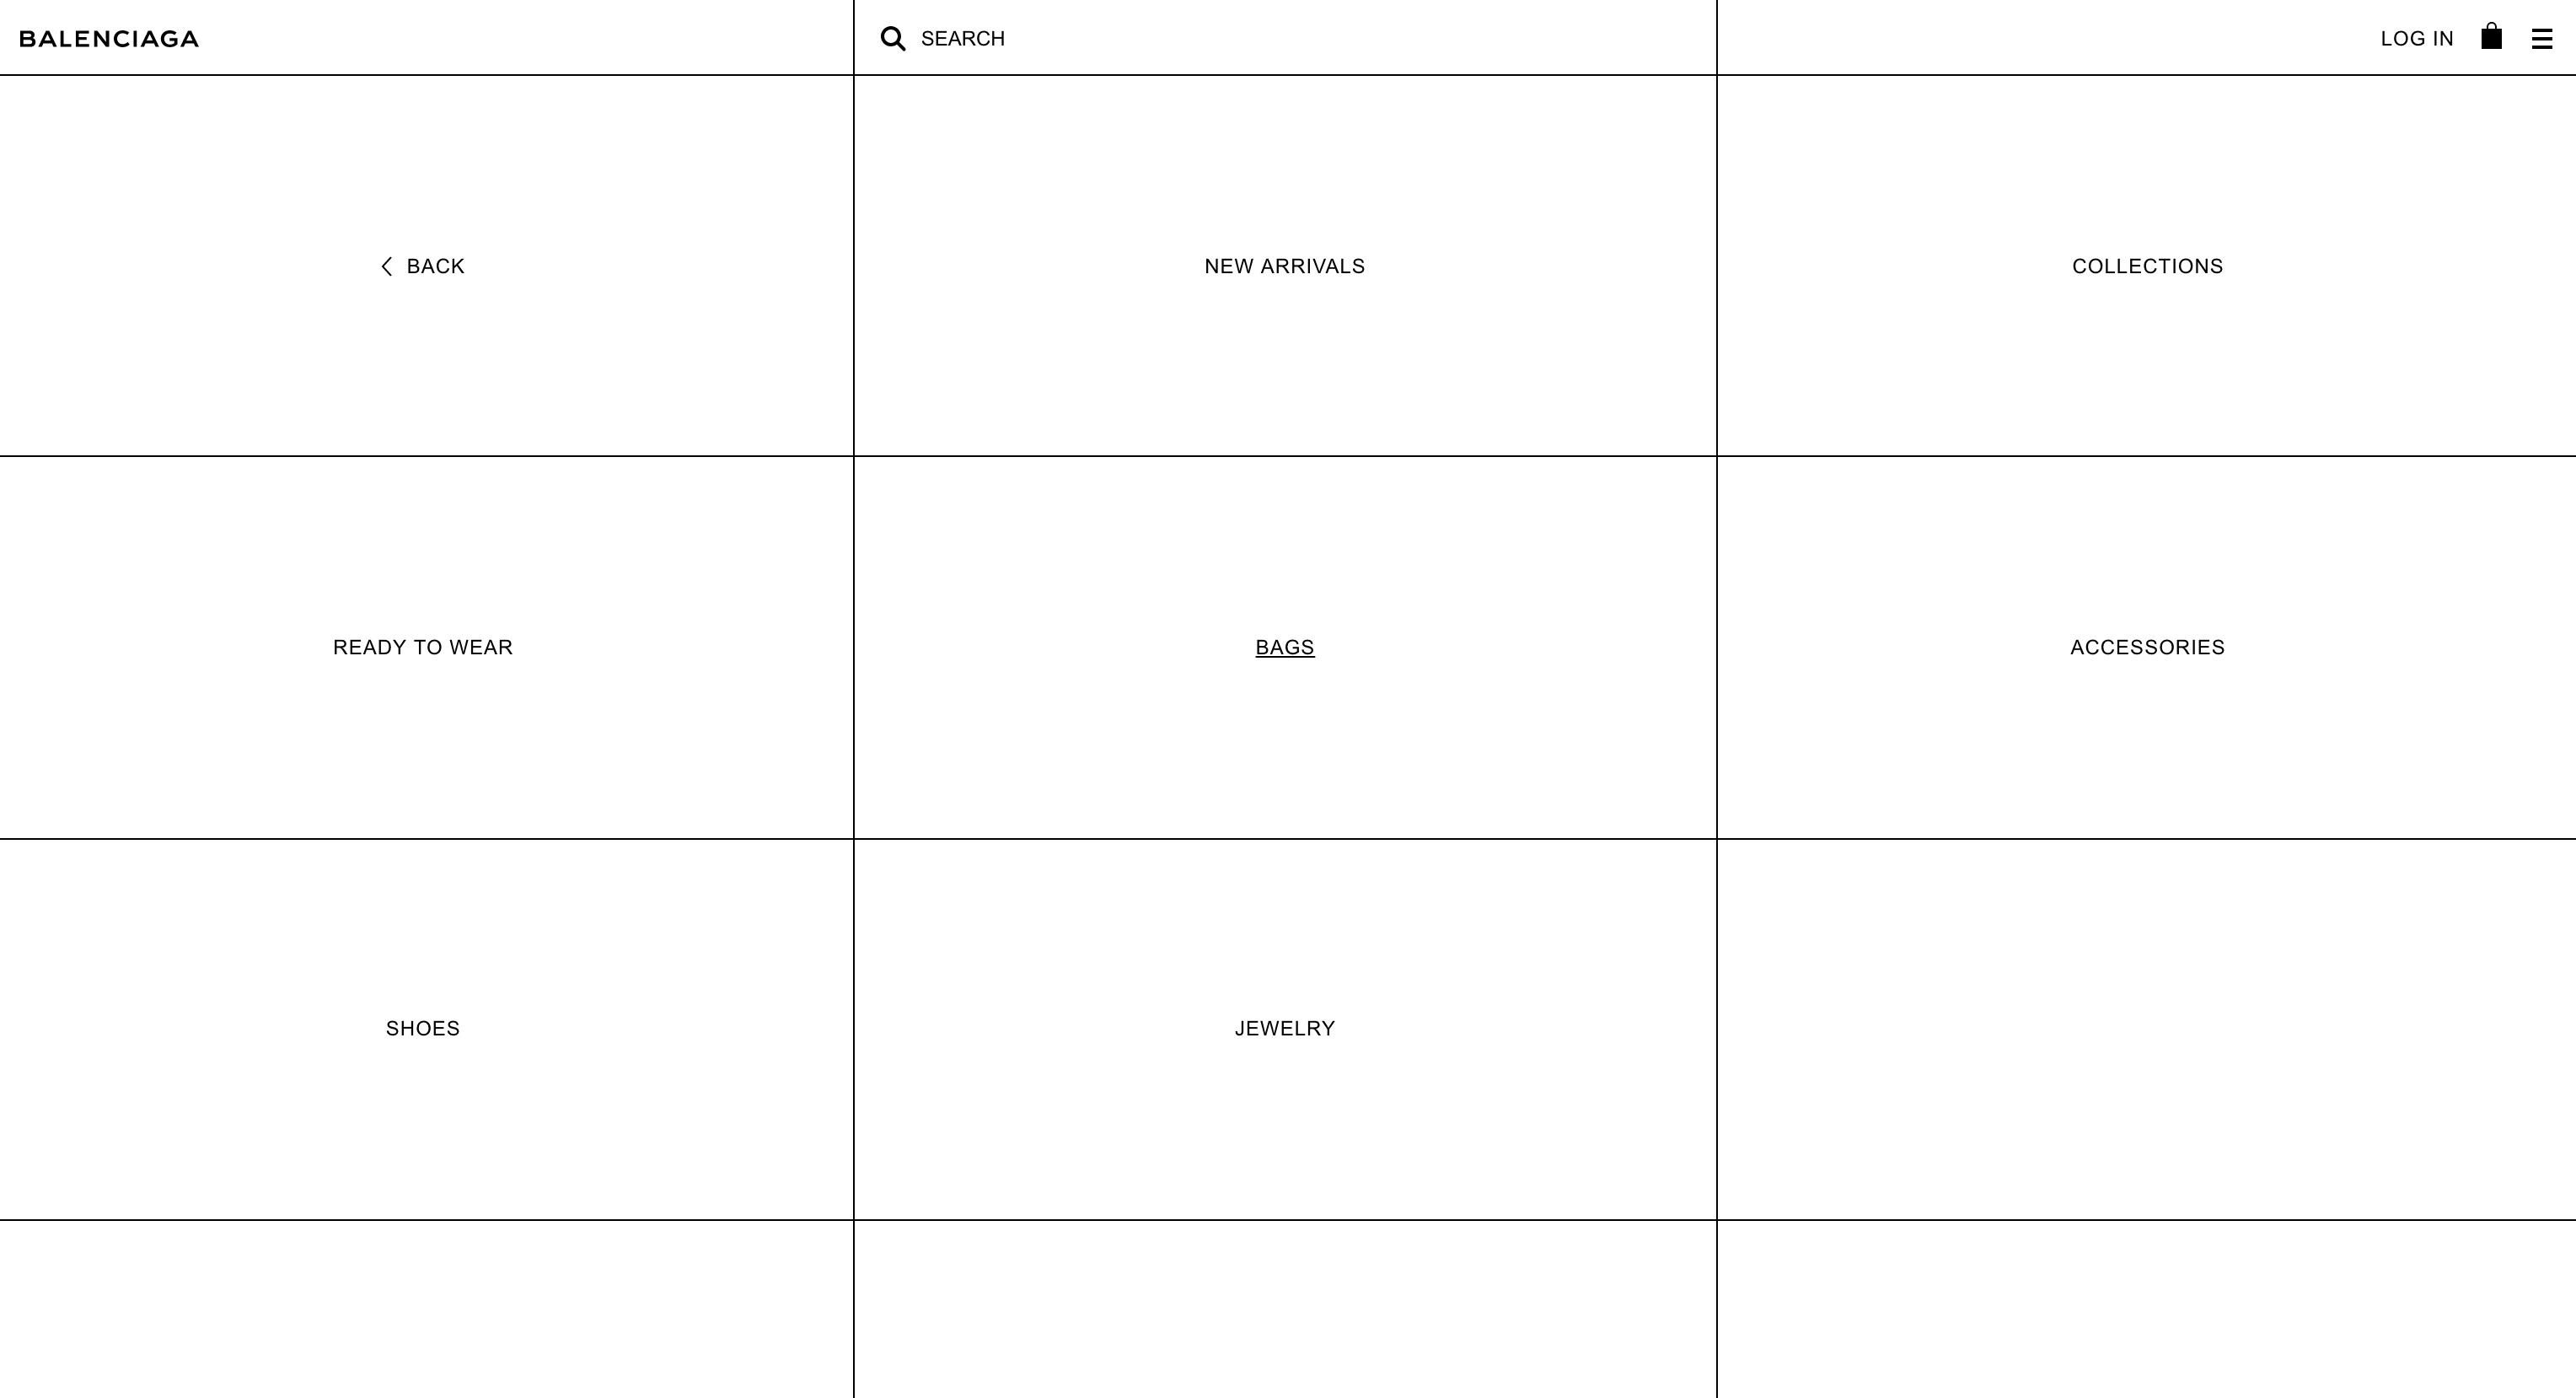 y'all been crazy designing websites but Balenciaga's